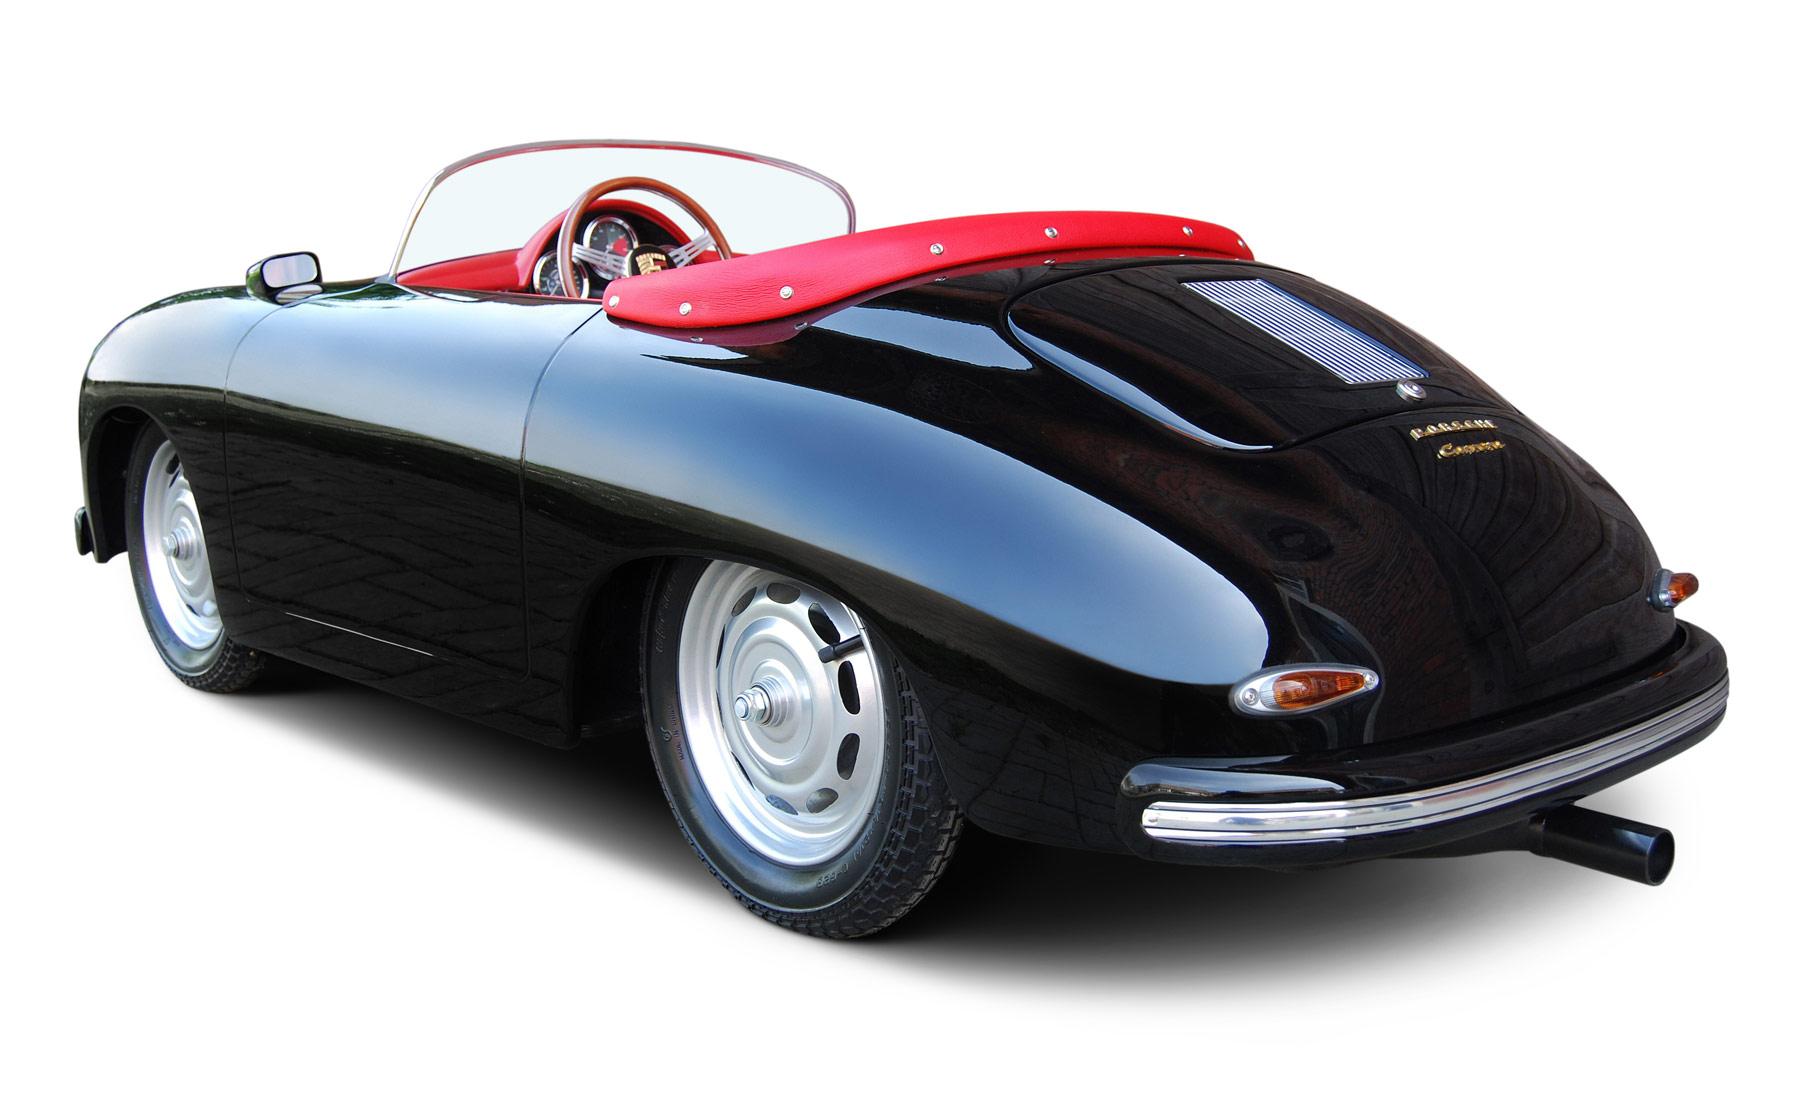 Pocket Classics Drives Forward With New Porsche 356 Speedster